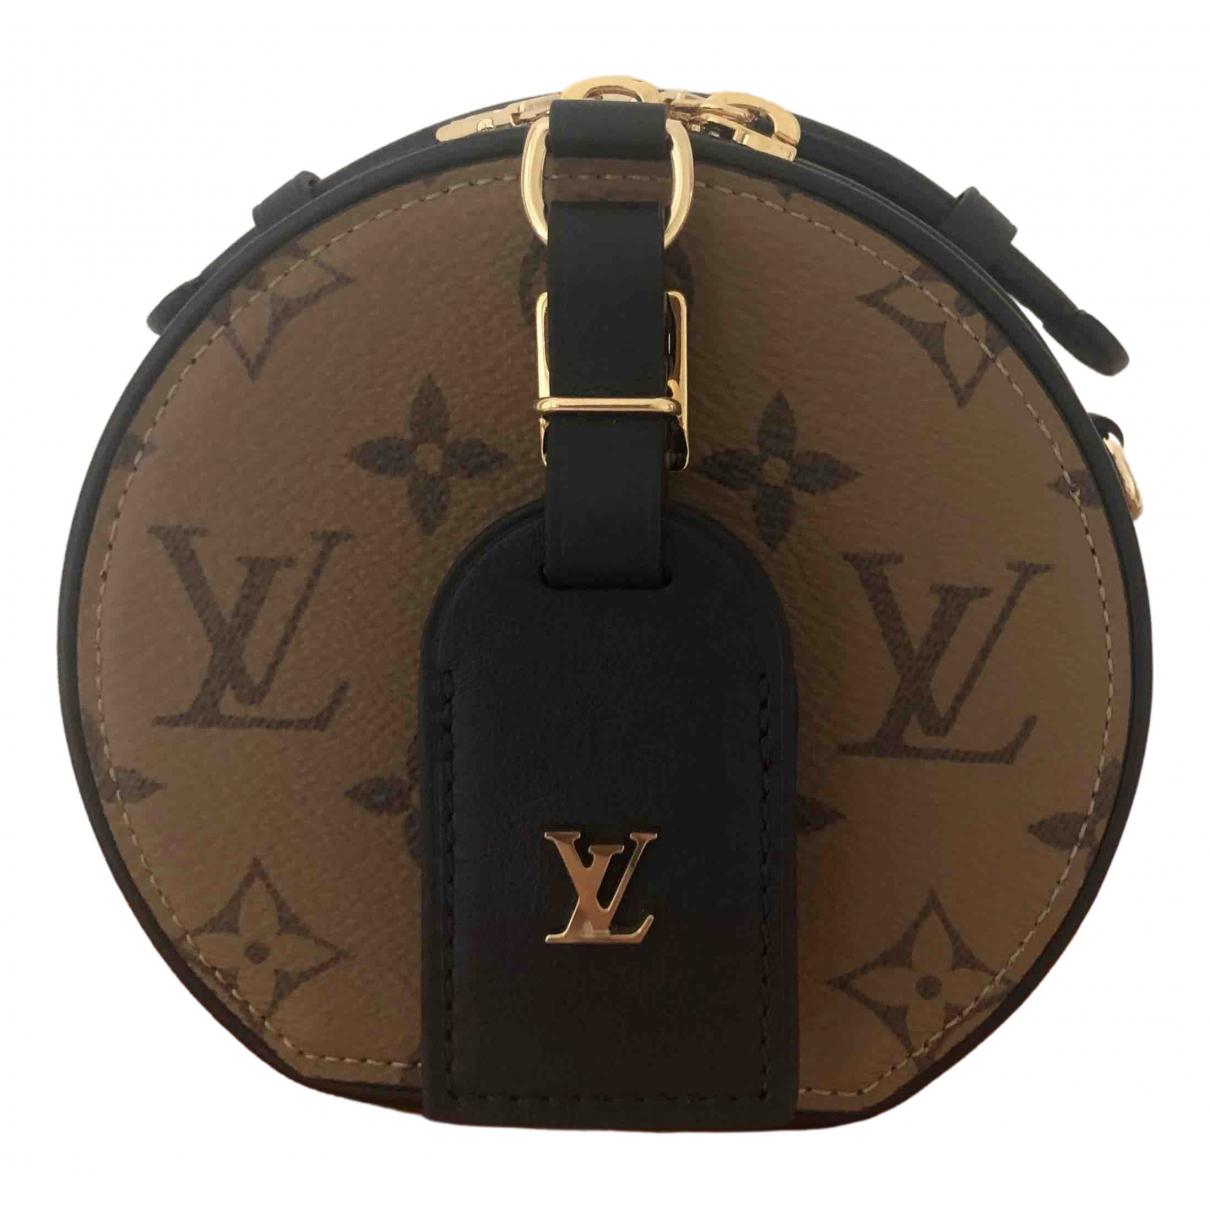 Bandolera Petite Boite a Chapeau de Lona Louis Vuitton